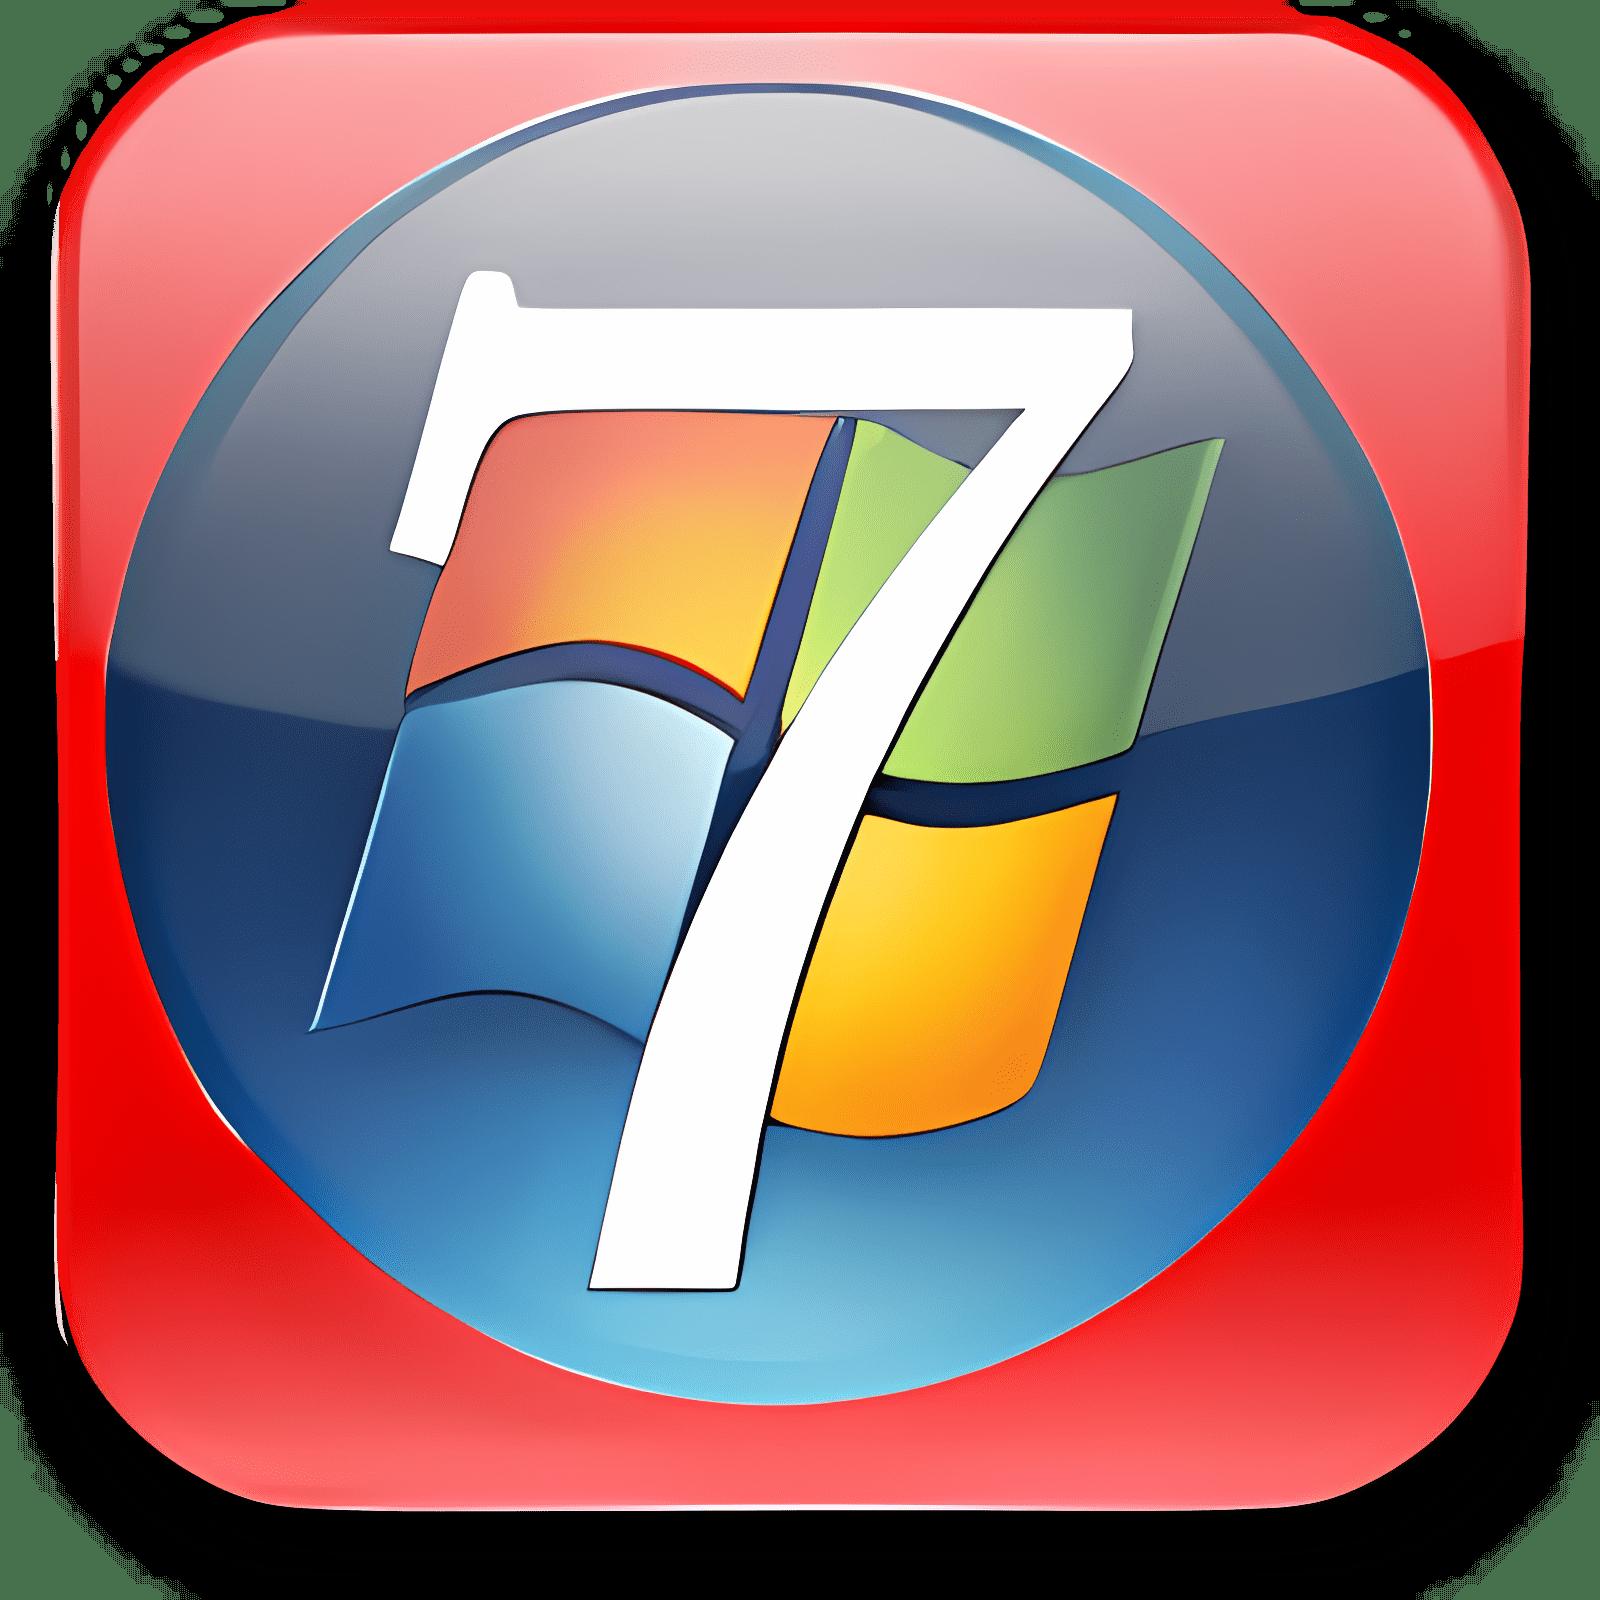 Windows 7 Service Pack 1